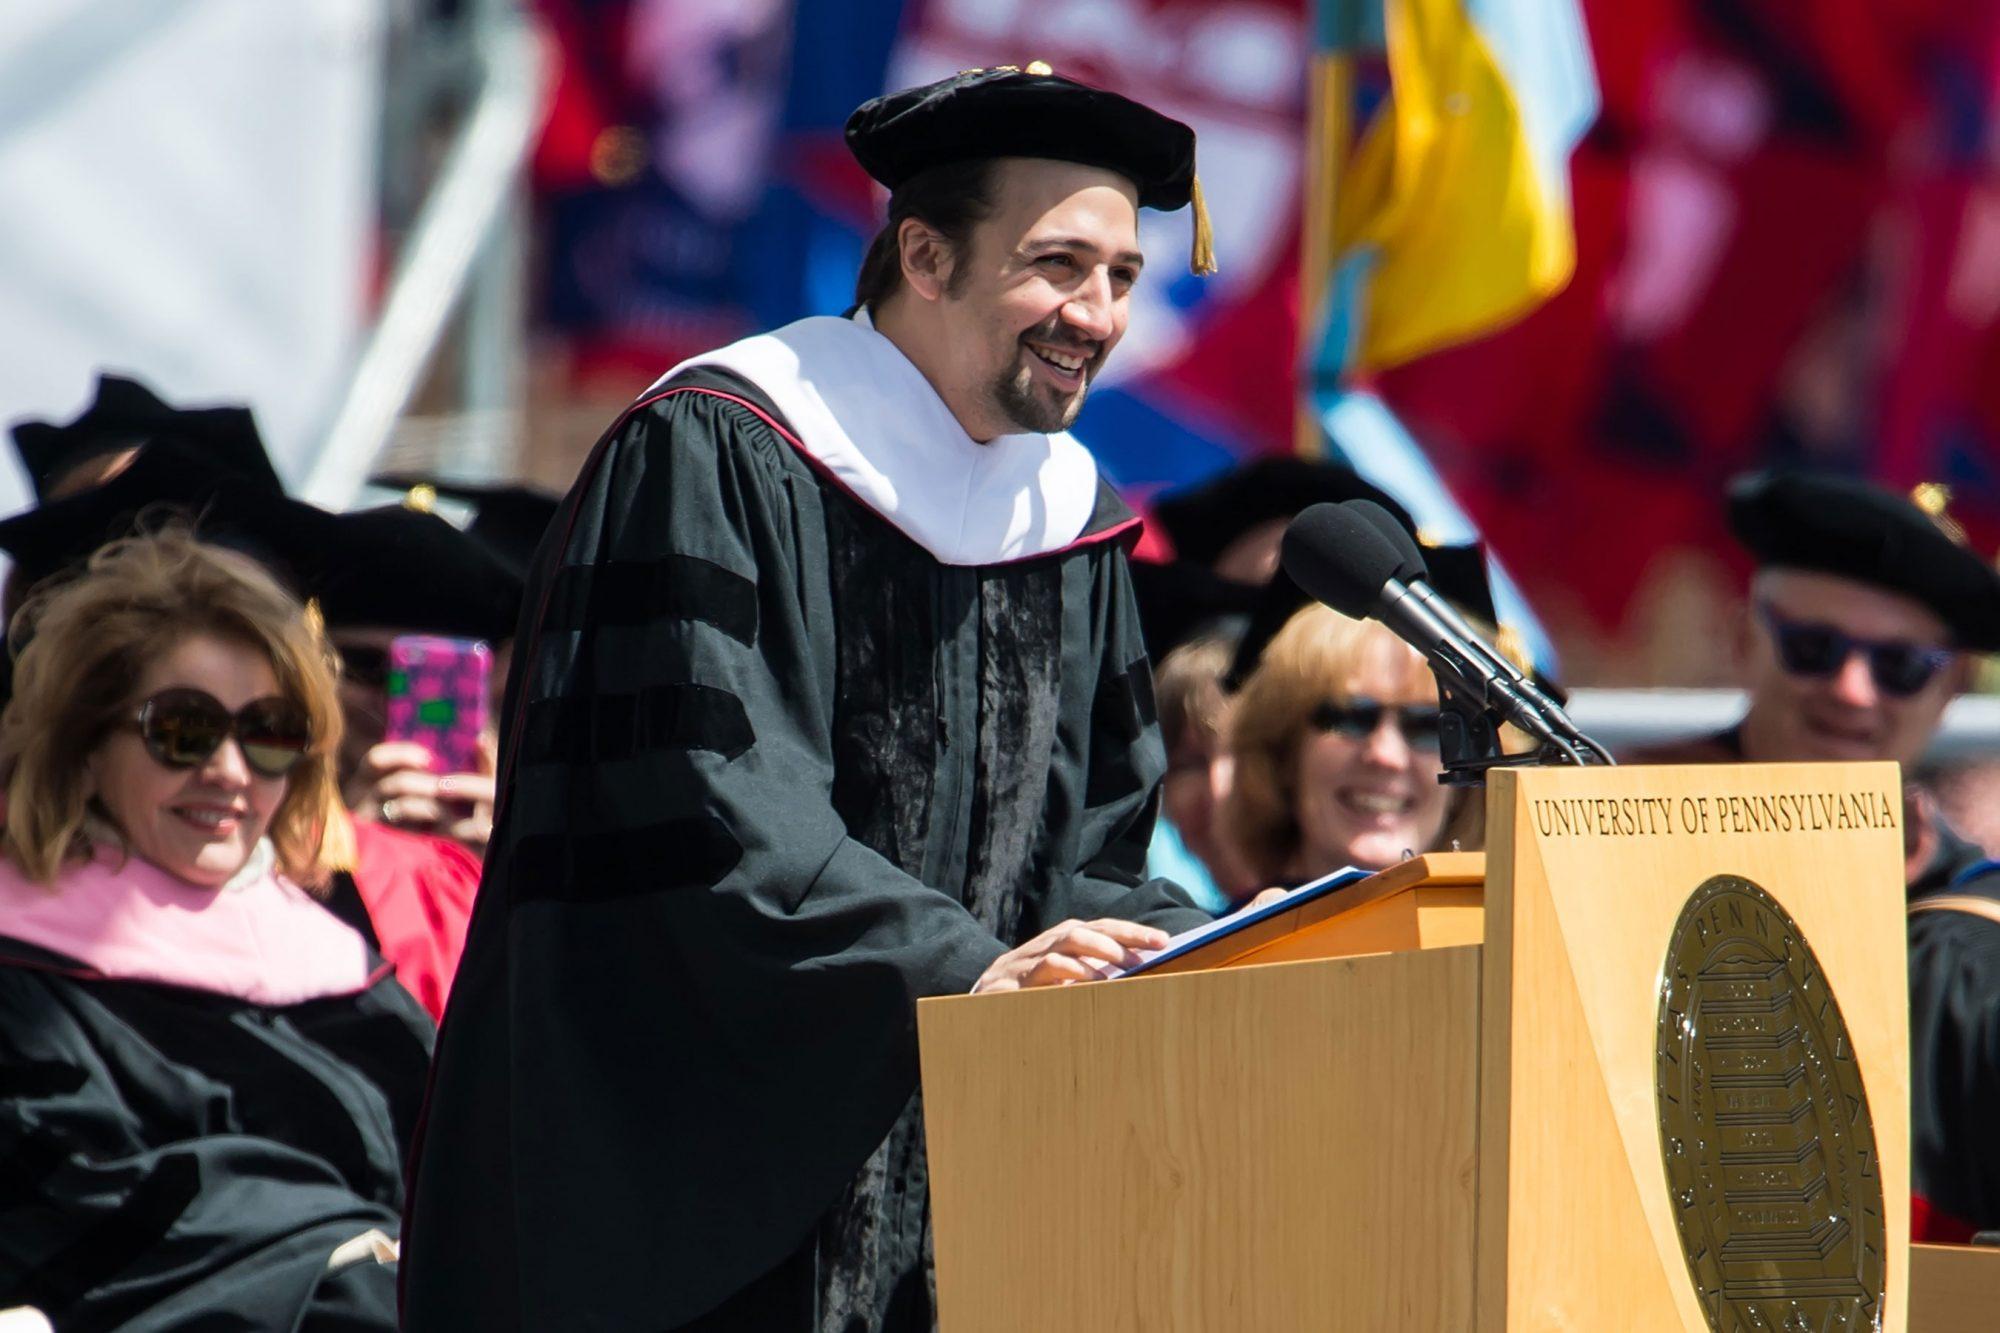 Lin Manuel Miranda Delivers University Of Pennsylvania Commencement Keynote Address